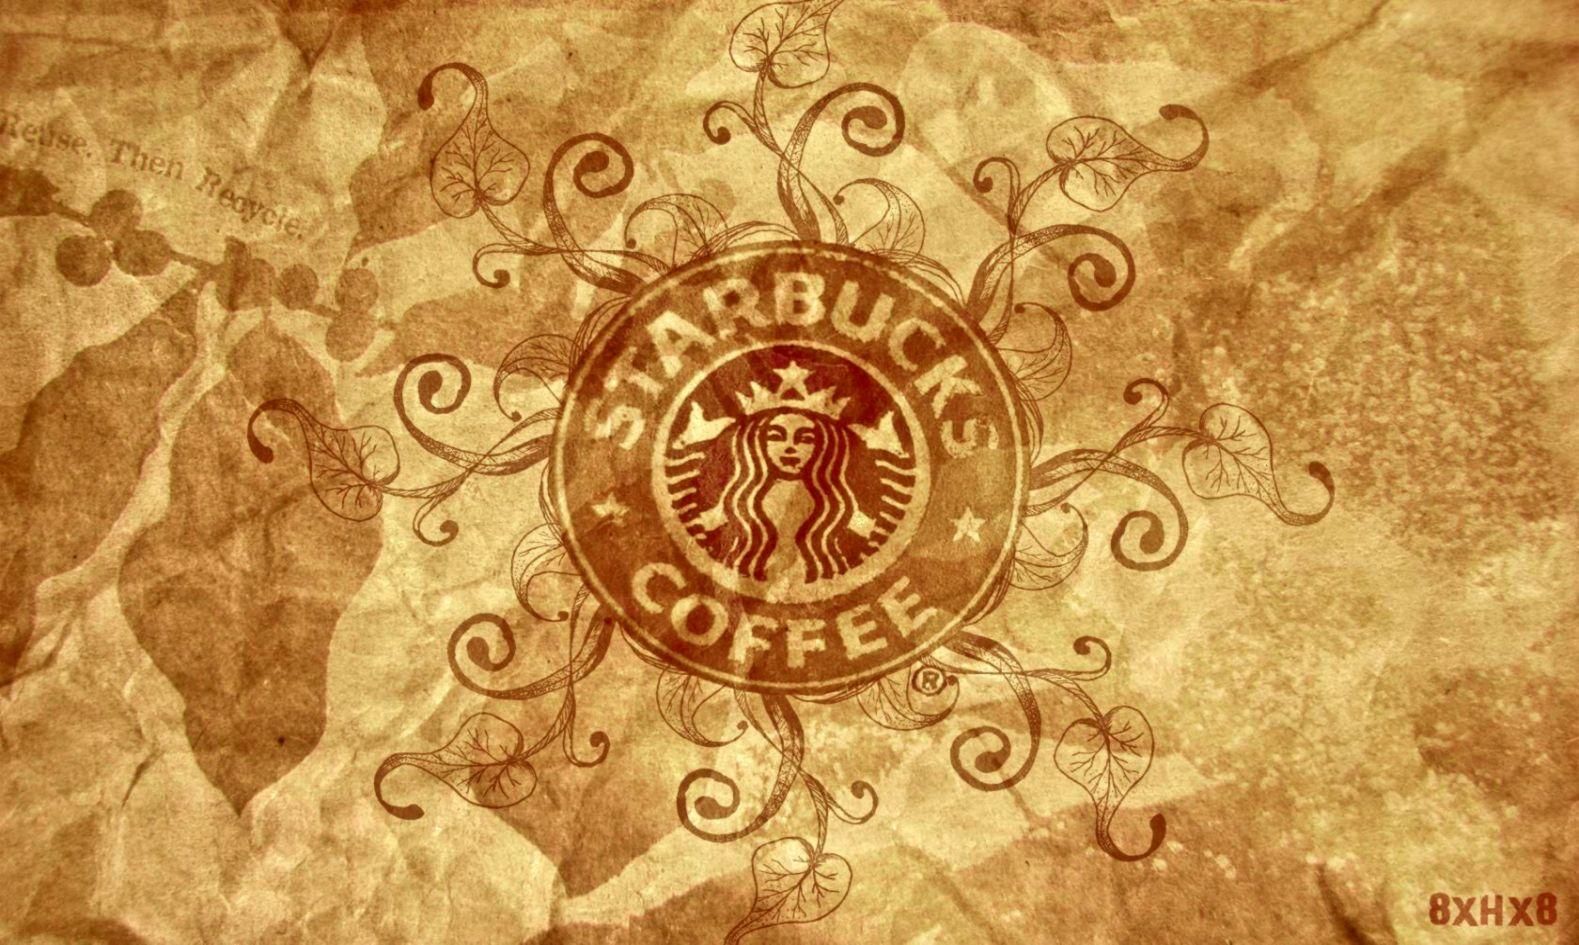 Starbucks Coffee Hd Desktop Wallpaper Wallpapers Quality